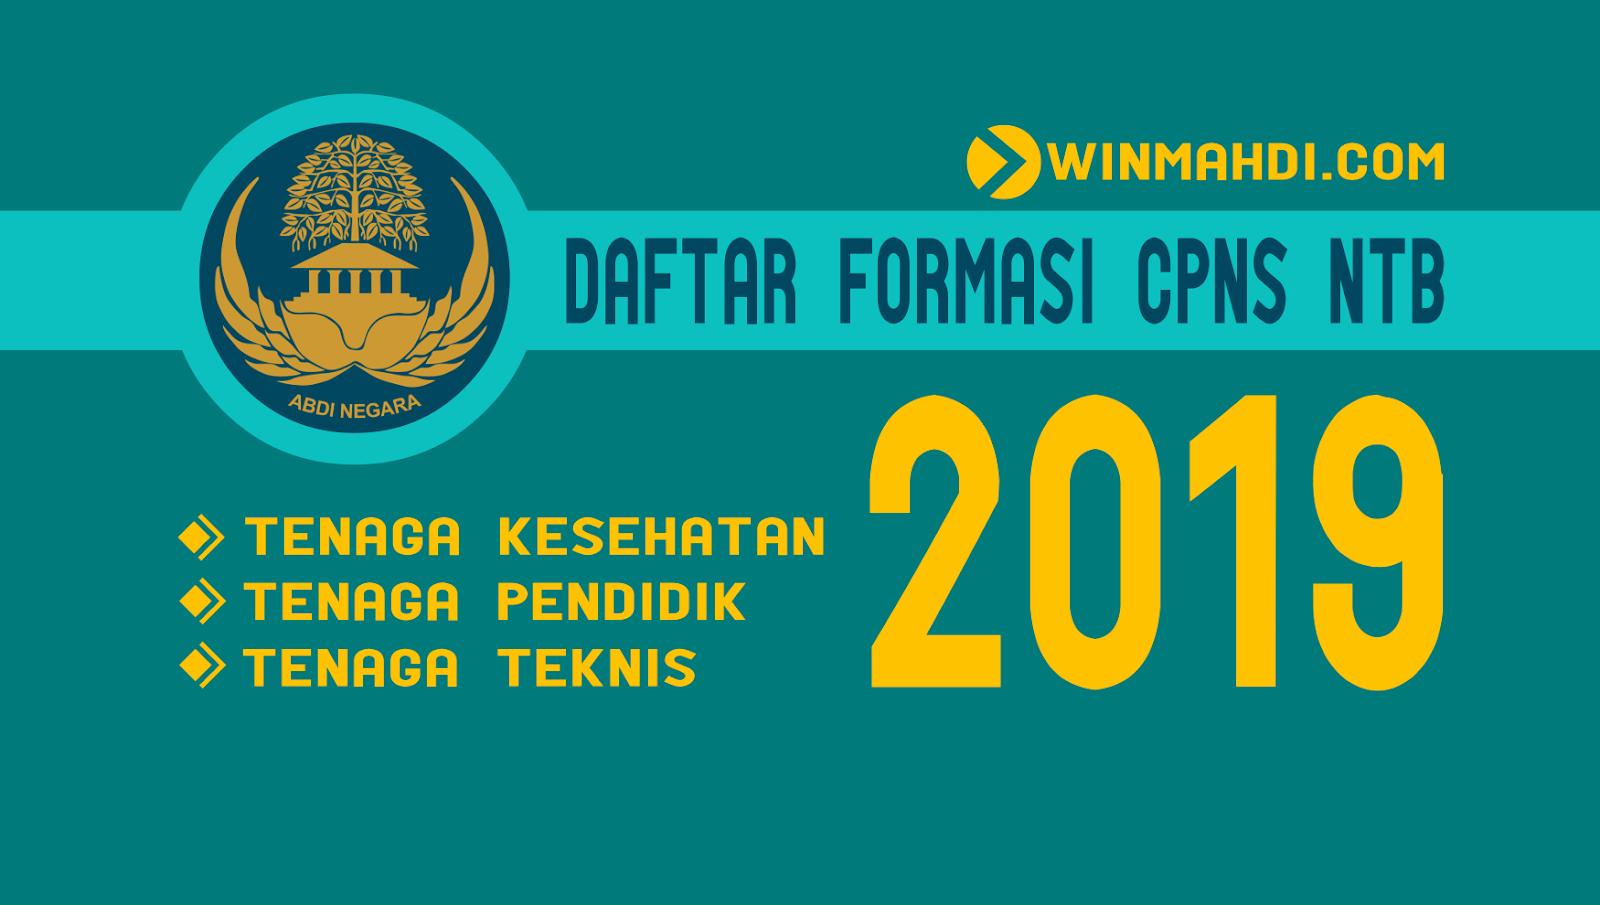 Daftar Formasi CPNS NTB 2019